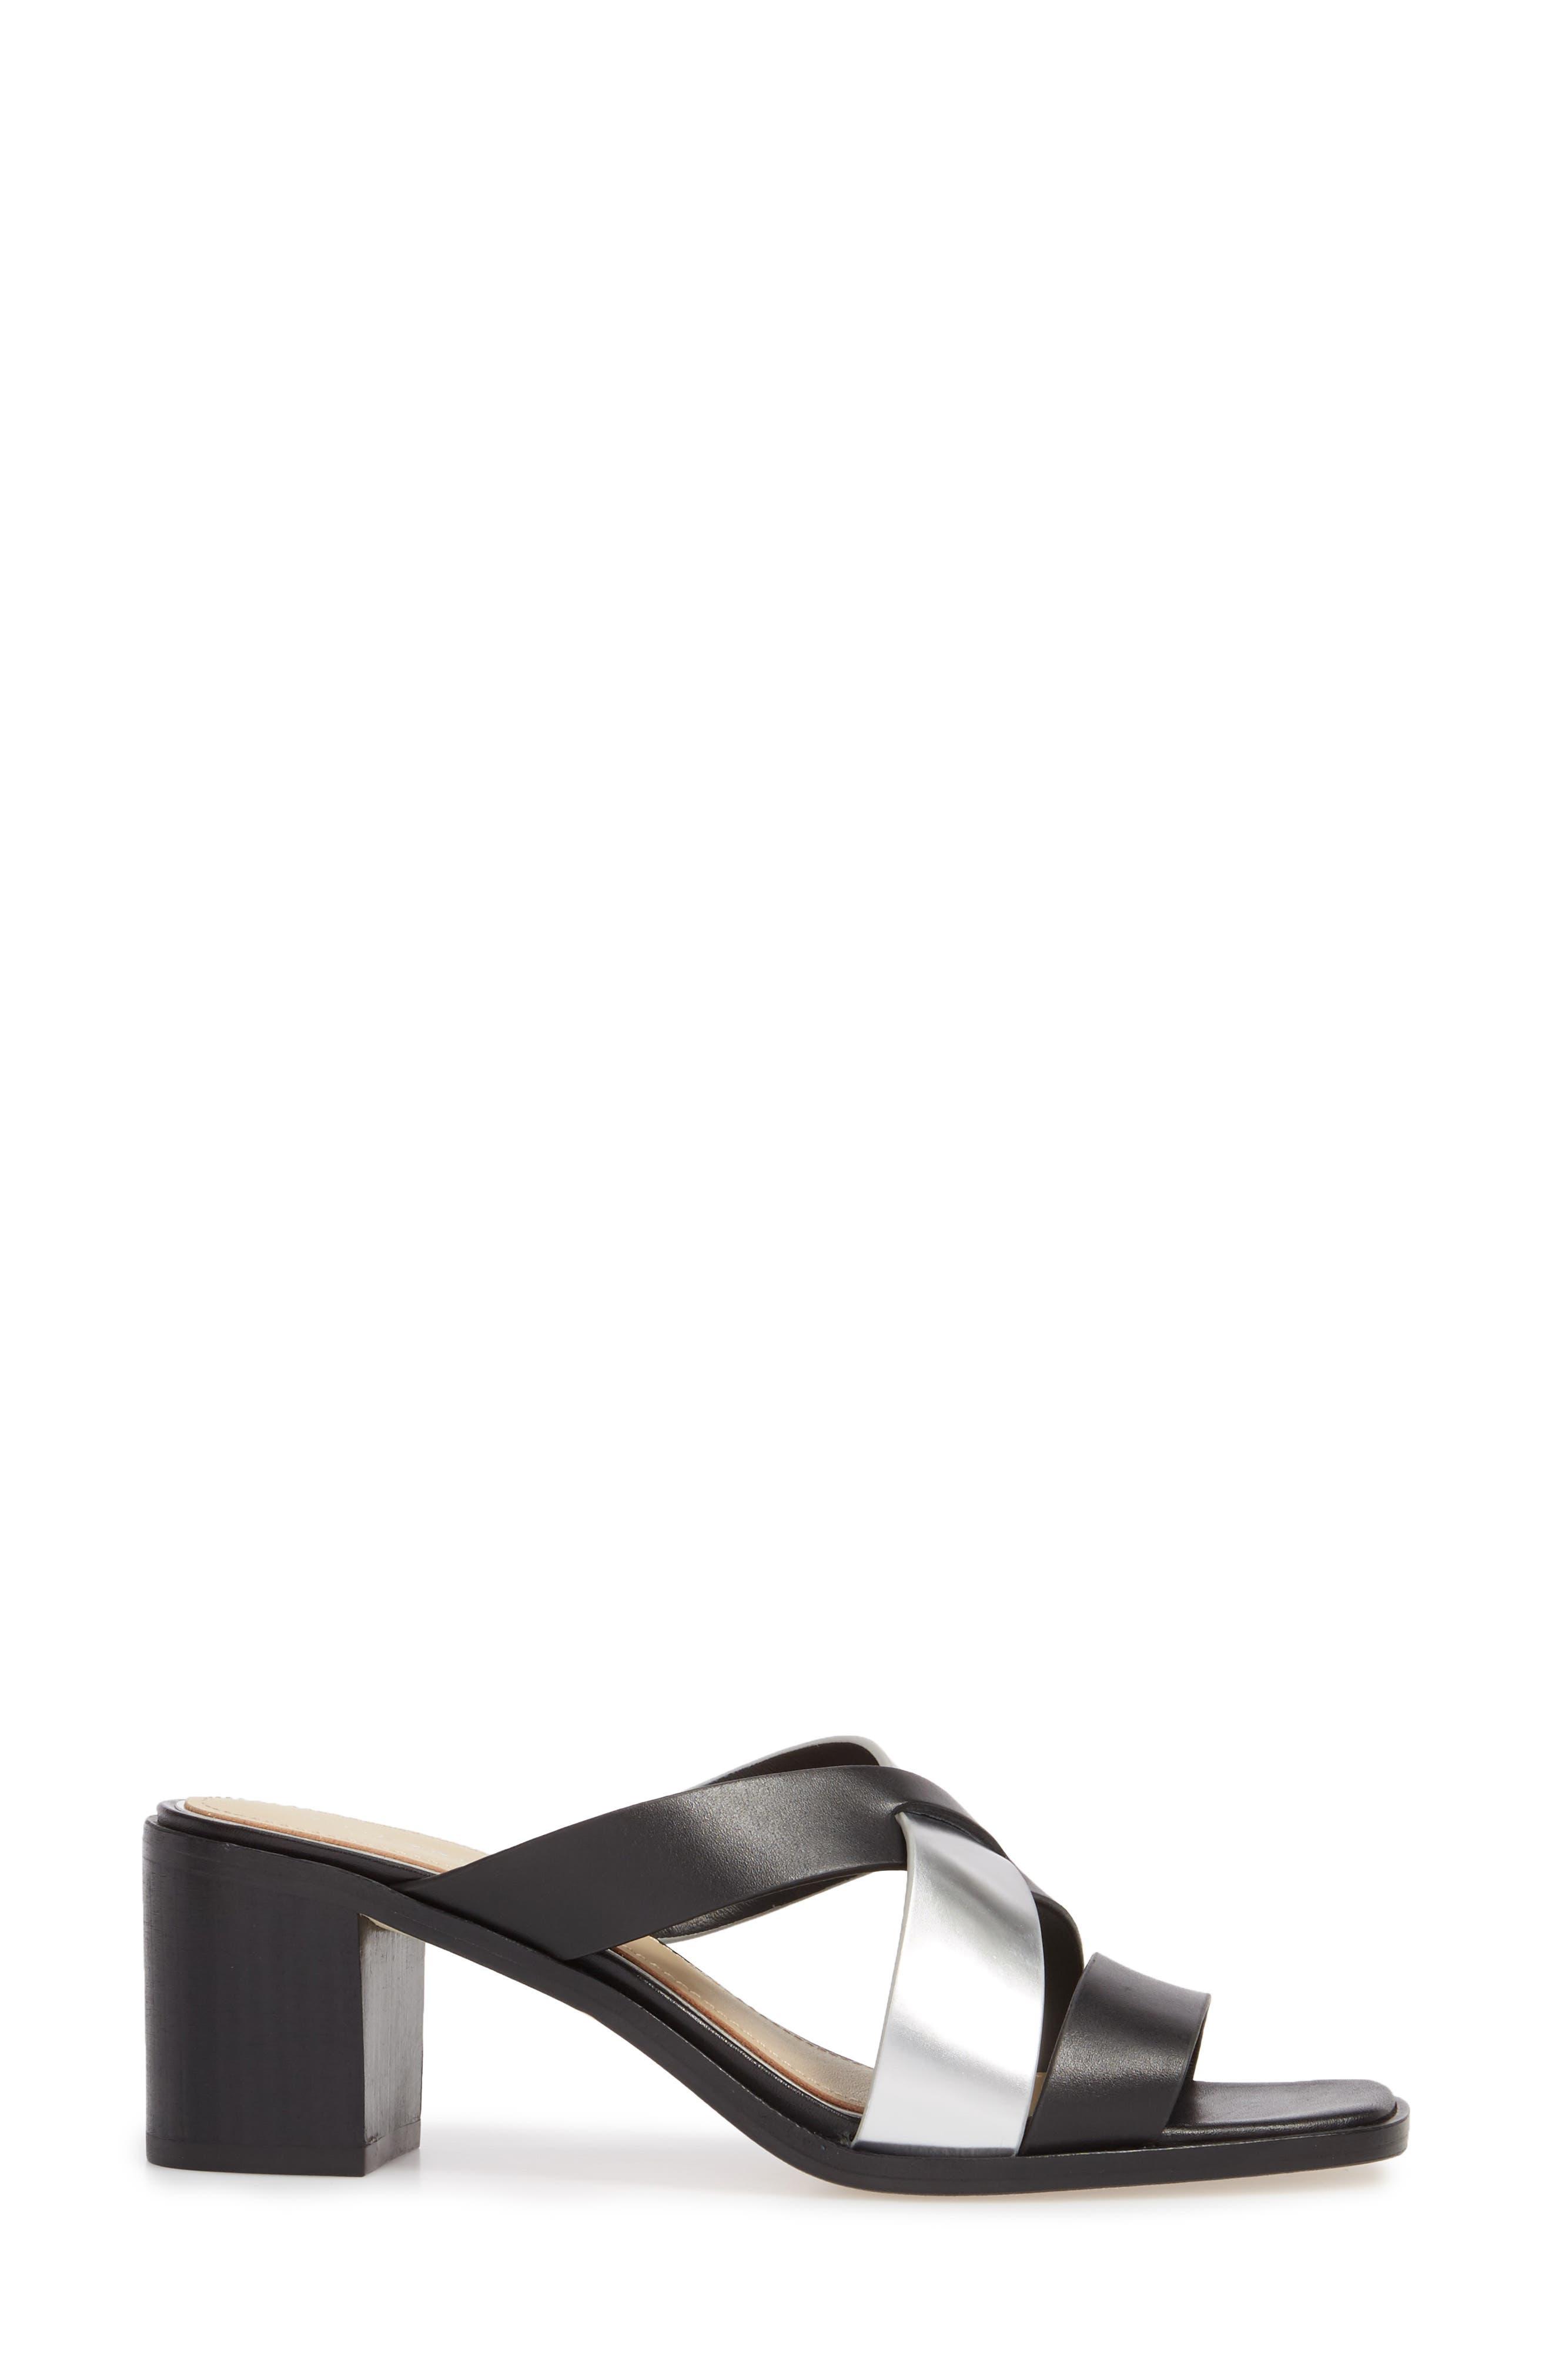 Negroni Cross Strap Mule Sandal,                             Alternate thumbnail 3, color,                             BLACK/ SILVER LEATHER